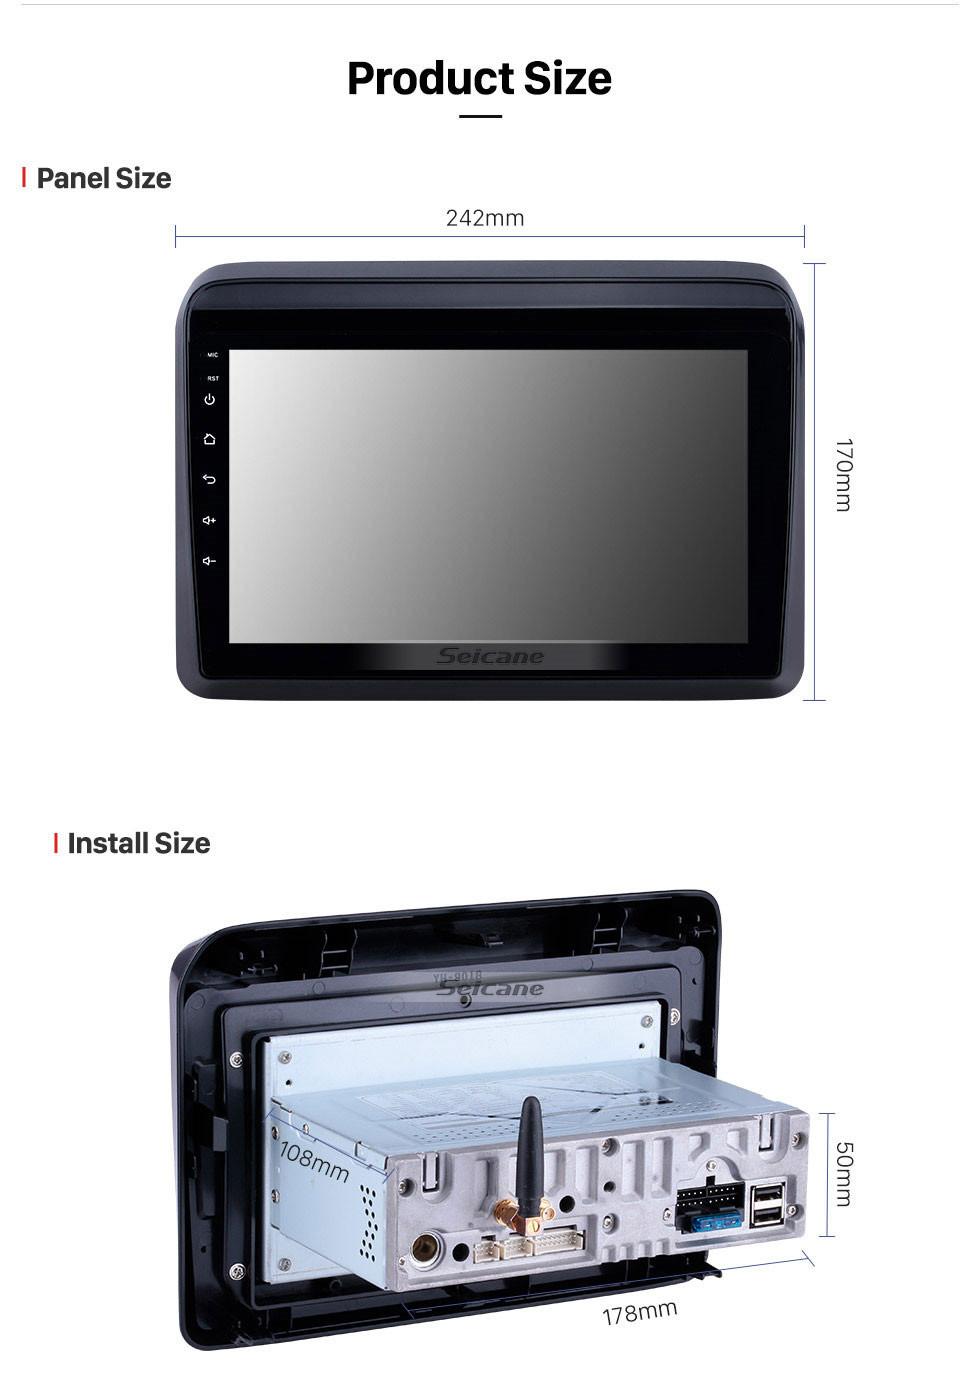 Seicane 9 Zoll HD Touchscreen 2018 2019 Suzuki ERTIGA Android 10.0 Radio mit GPS Navigationssystem Wlan USB Bluetooth Spiegel-Verbindung Unterstützung Backup Kamera DVR 1080 p DVD Spieler TPMS